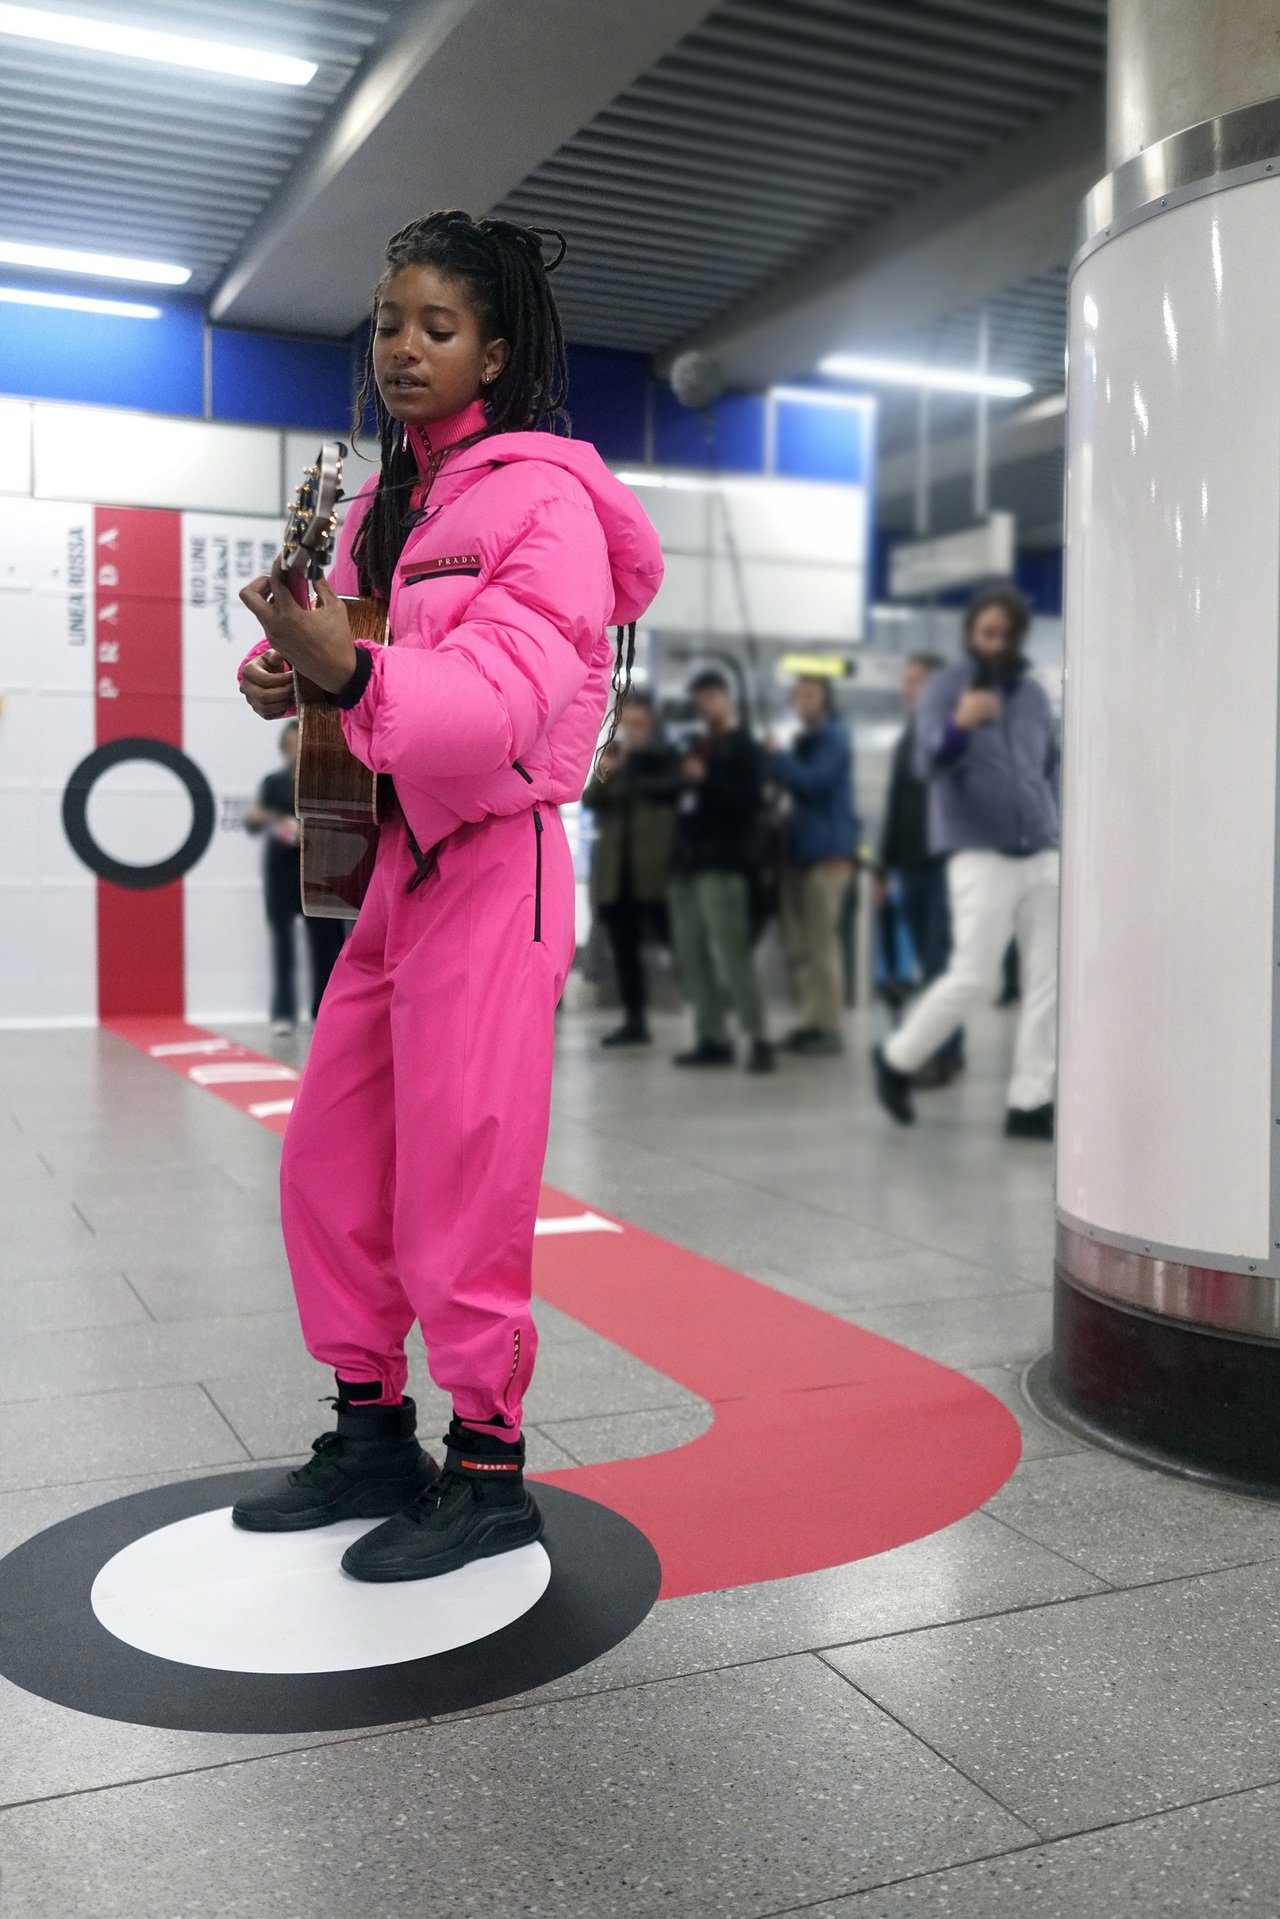 Prada本季特別攜手威爾史密斯的女兒薇洛史密斯拍攝形象照,選在倫敦地鐵中央線沿...